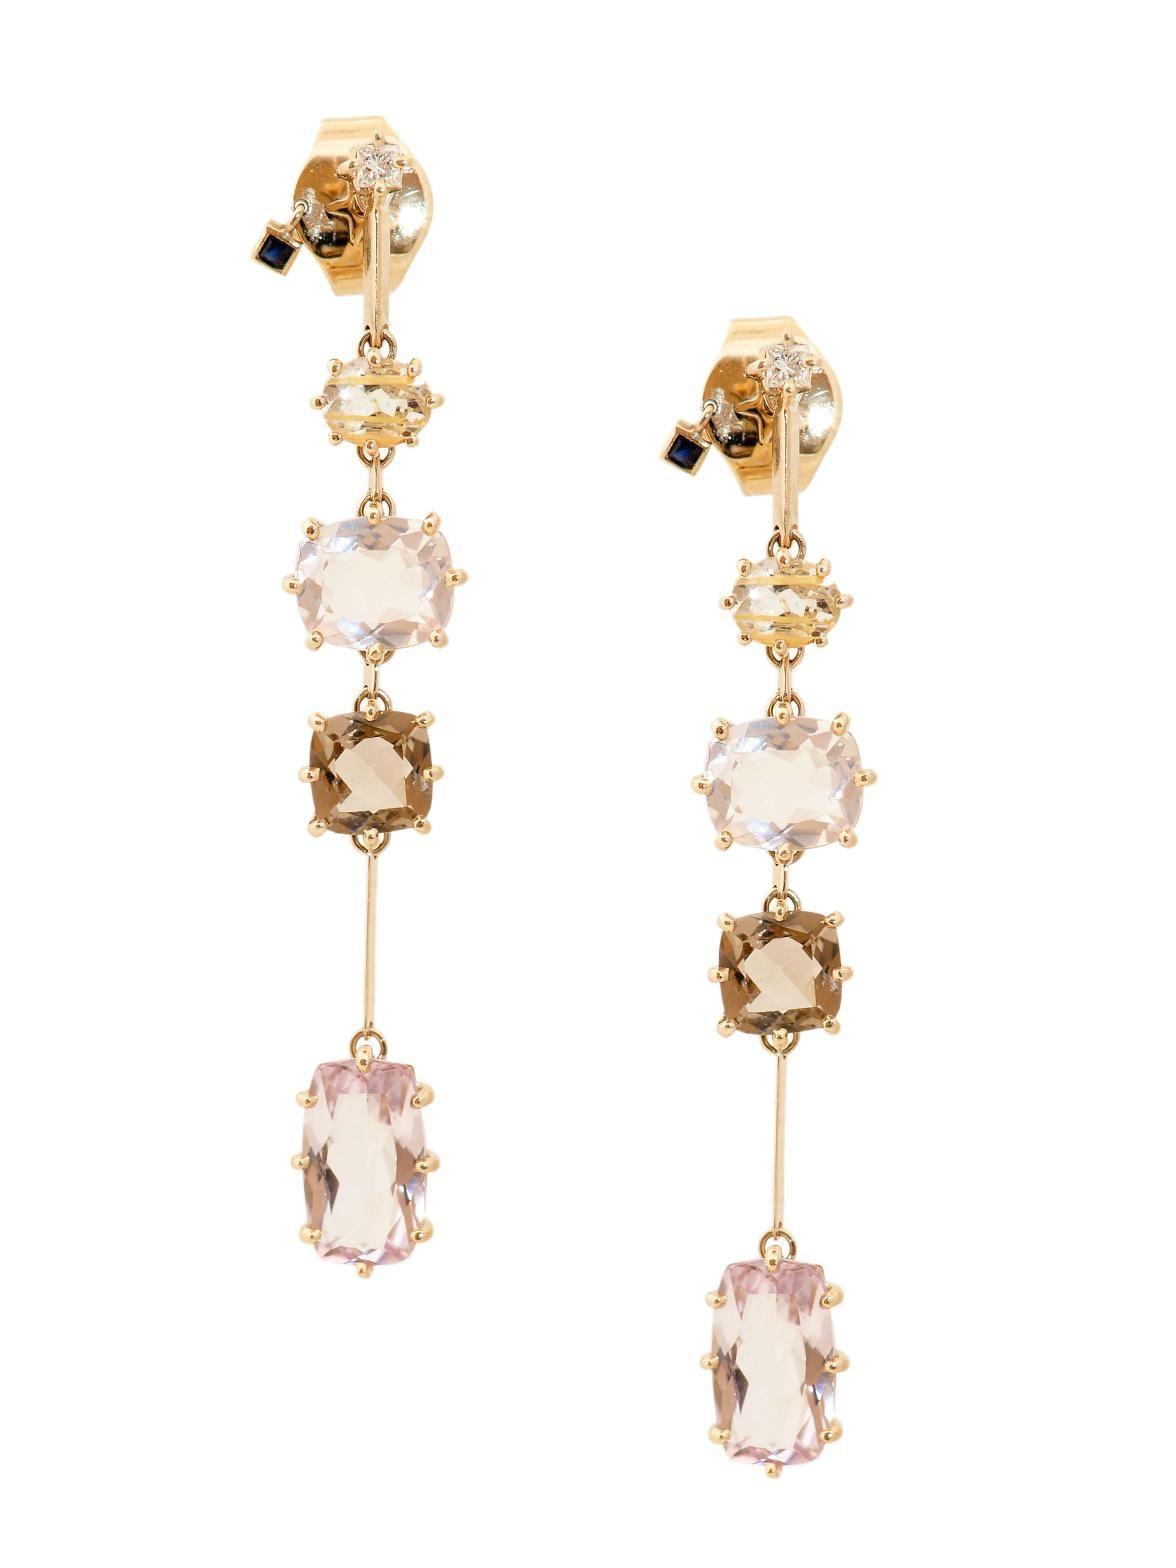 4153f1f0 H.Stern 18k Mixed Gemstone Sunrise Drop Earrings at London Jewelers ...